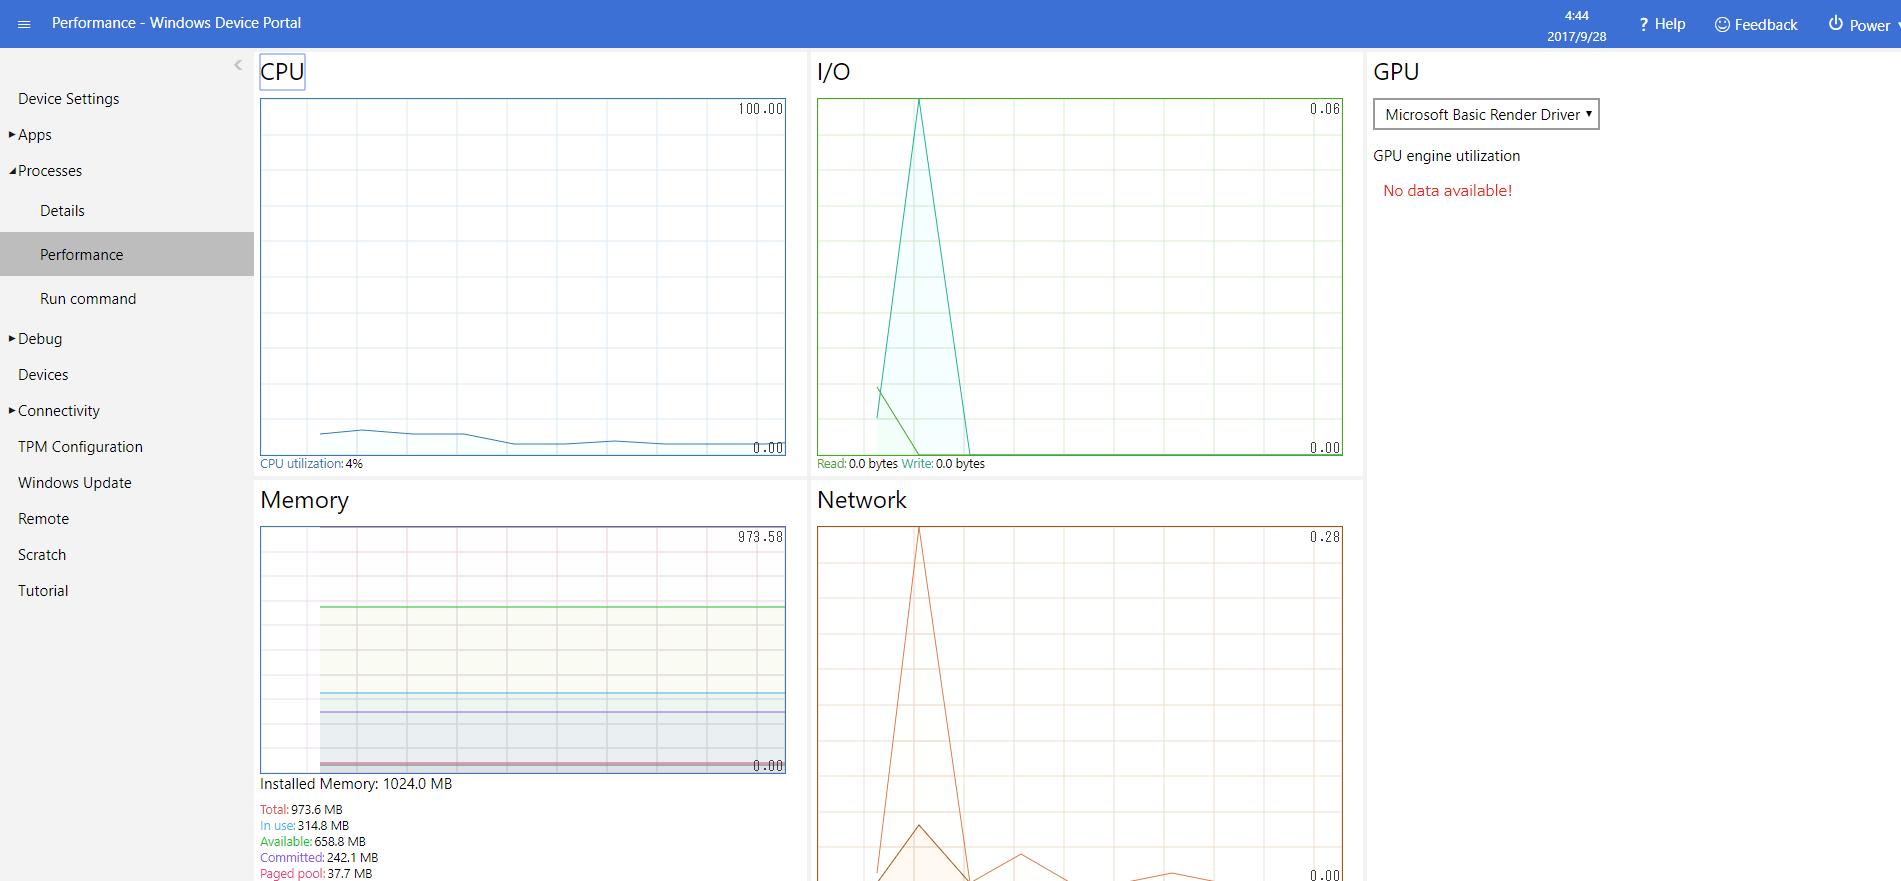 Windows Device Portal Performance